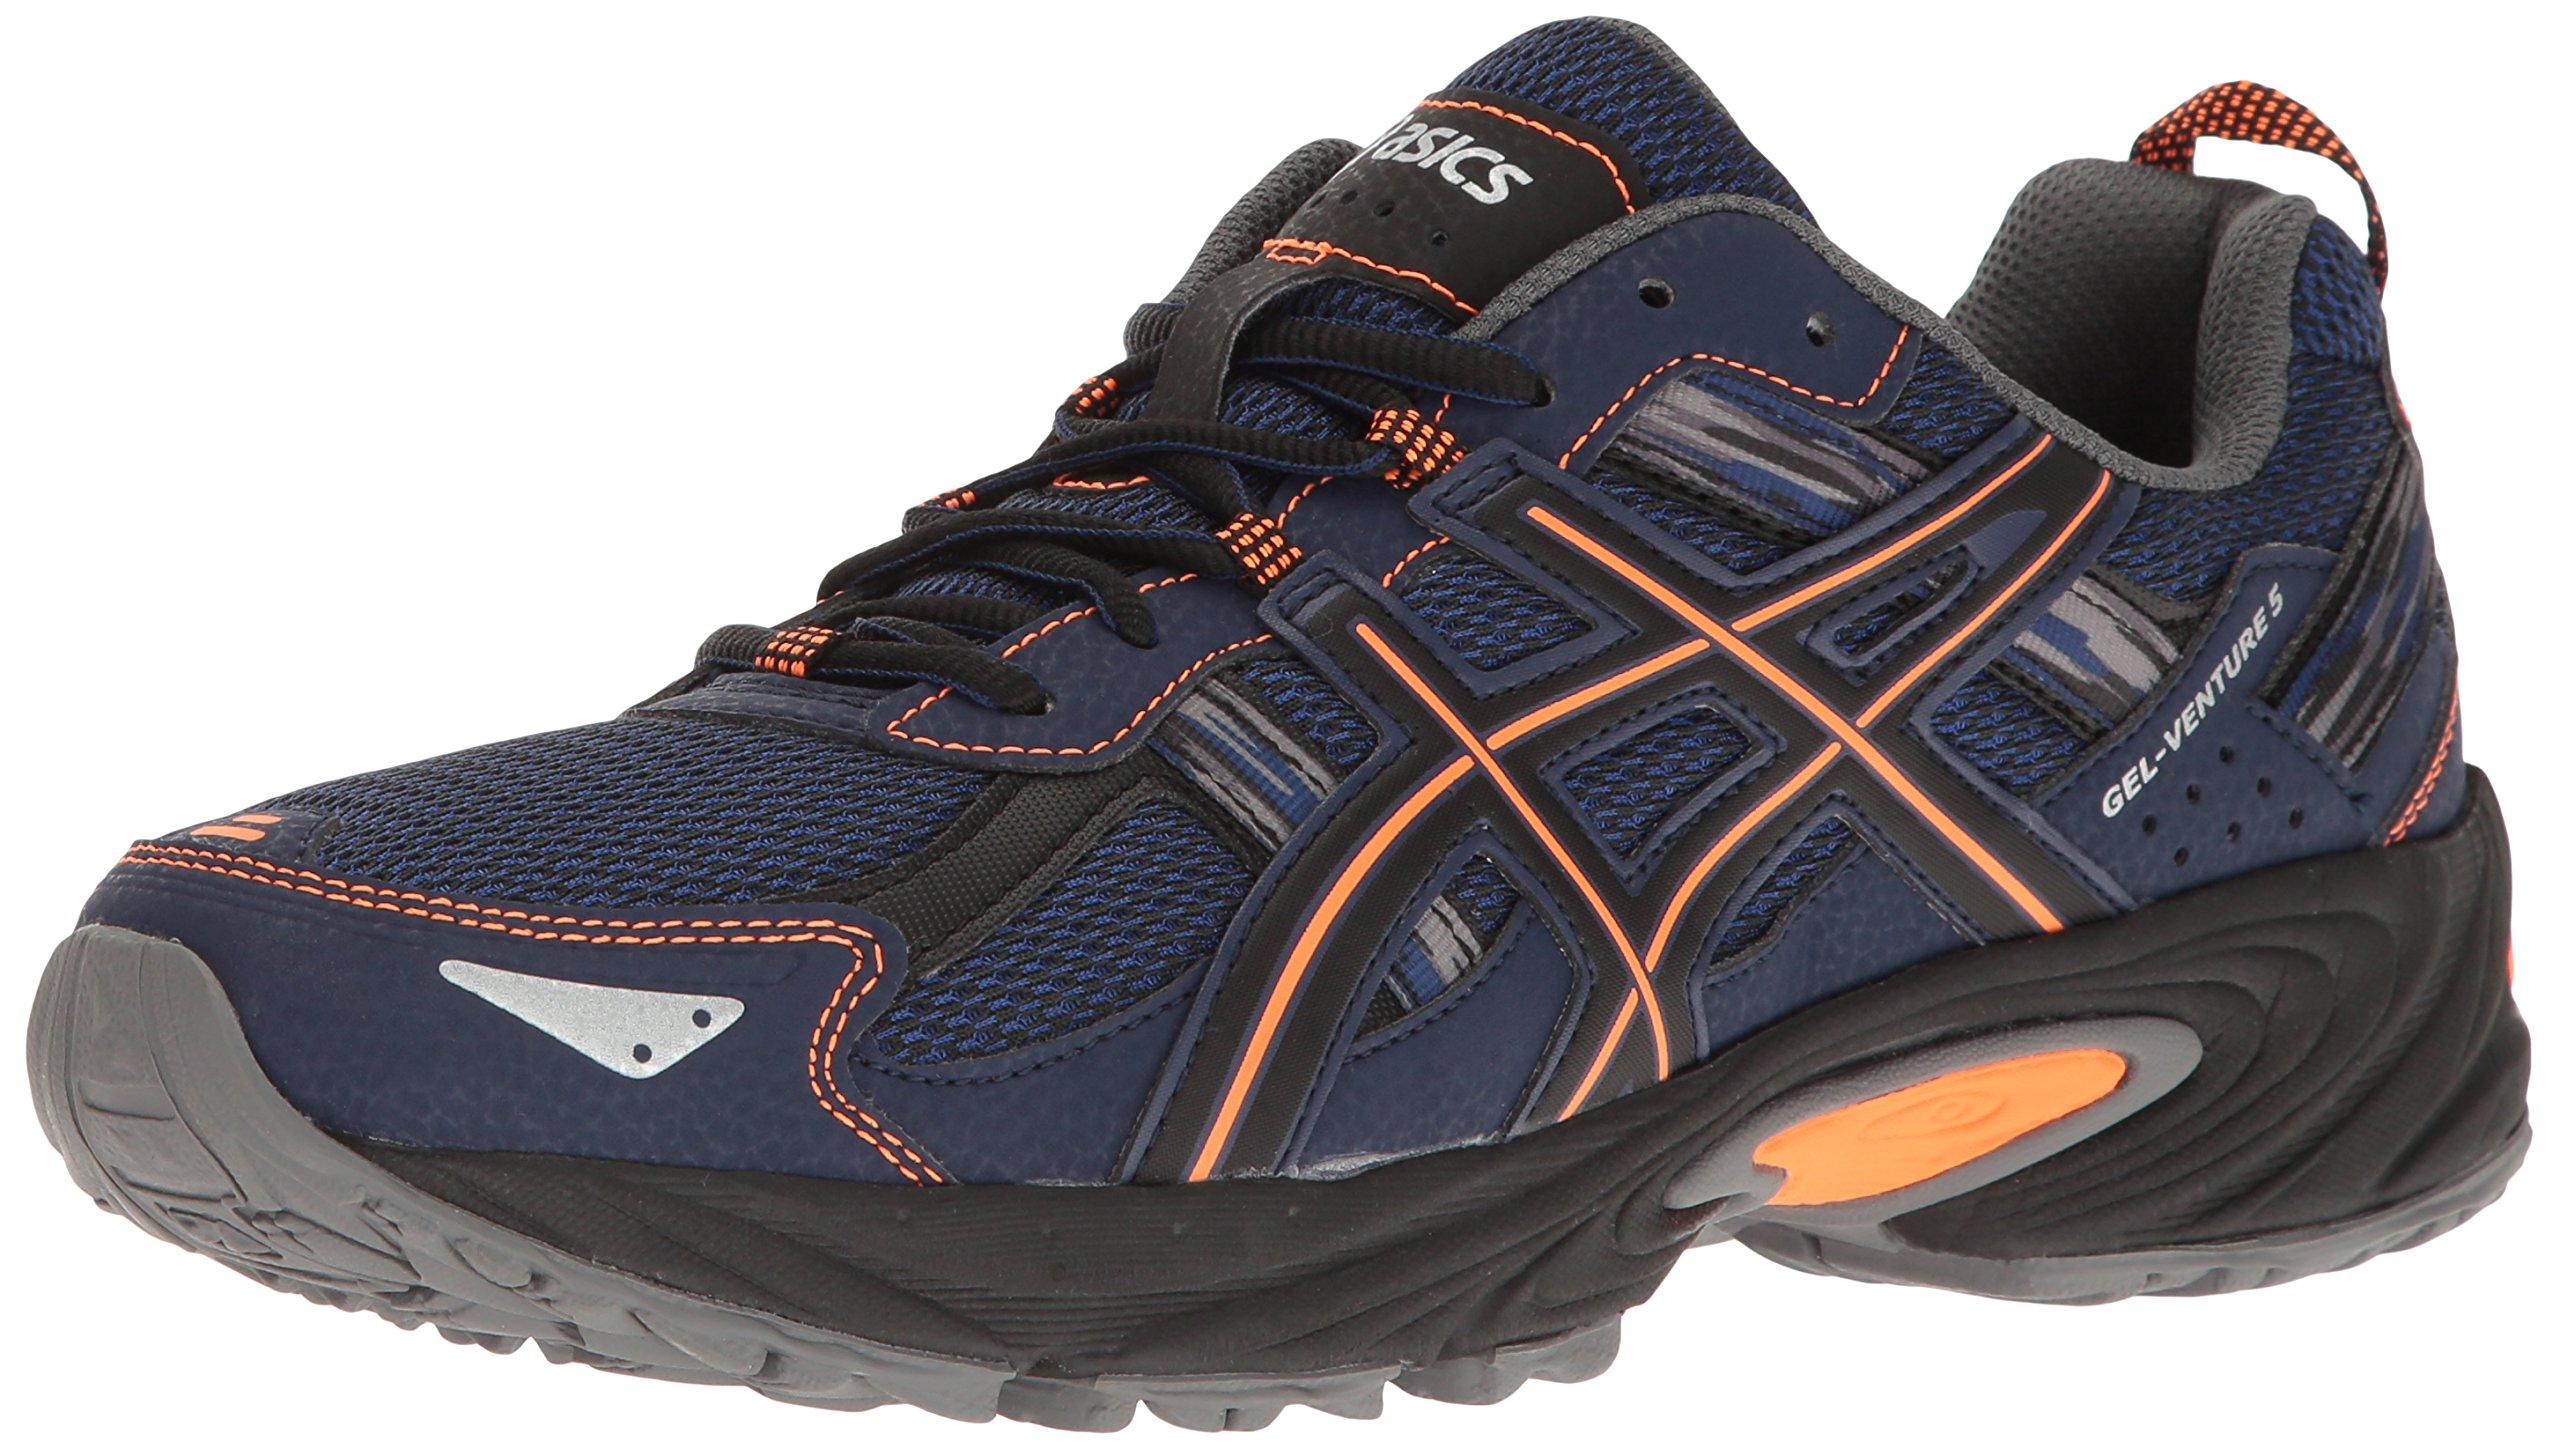 ASICS Men's Gel-Venture 5 Trail Runner, Indigo Blue/Hot Orange/Black, 8 M US